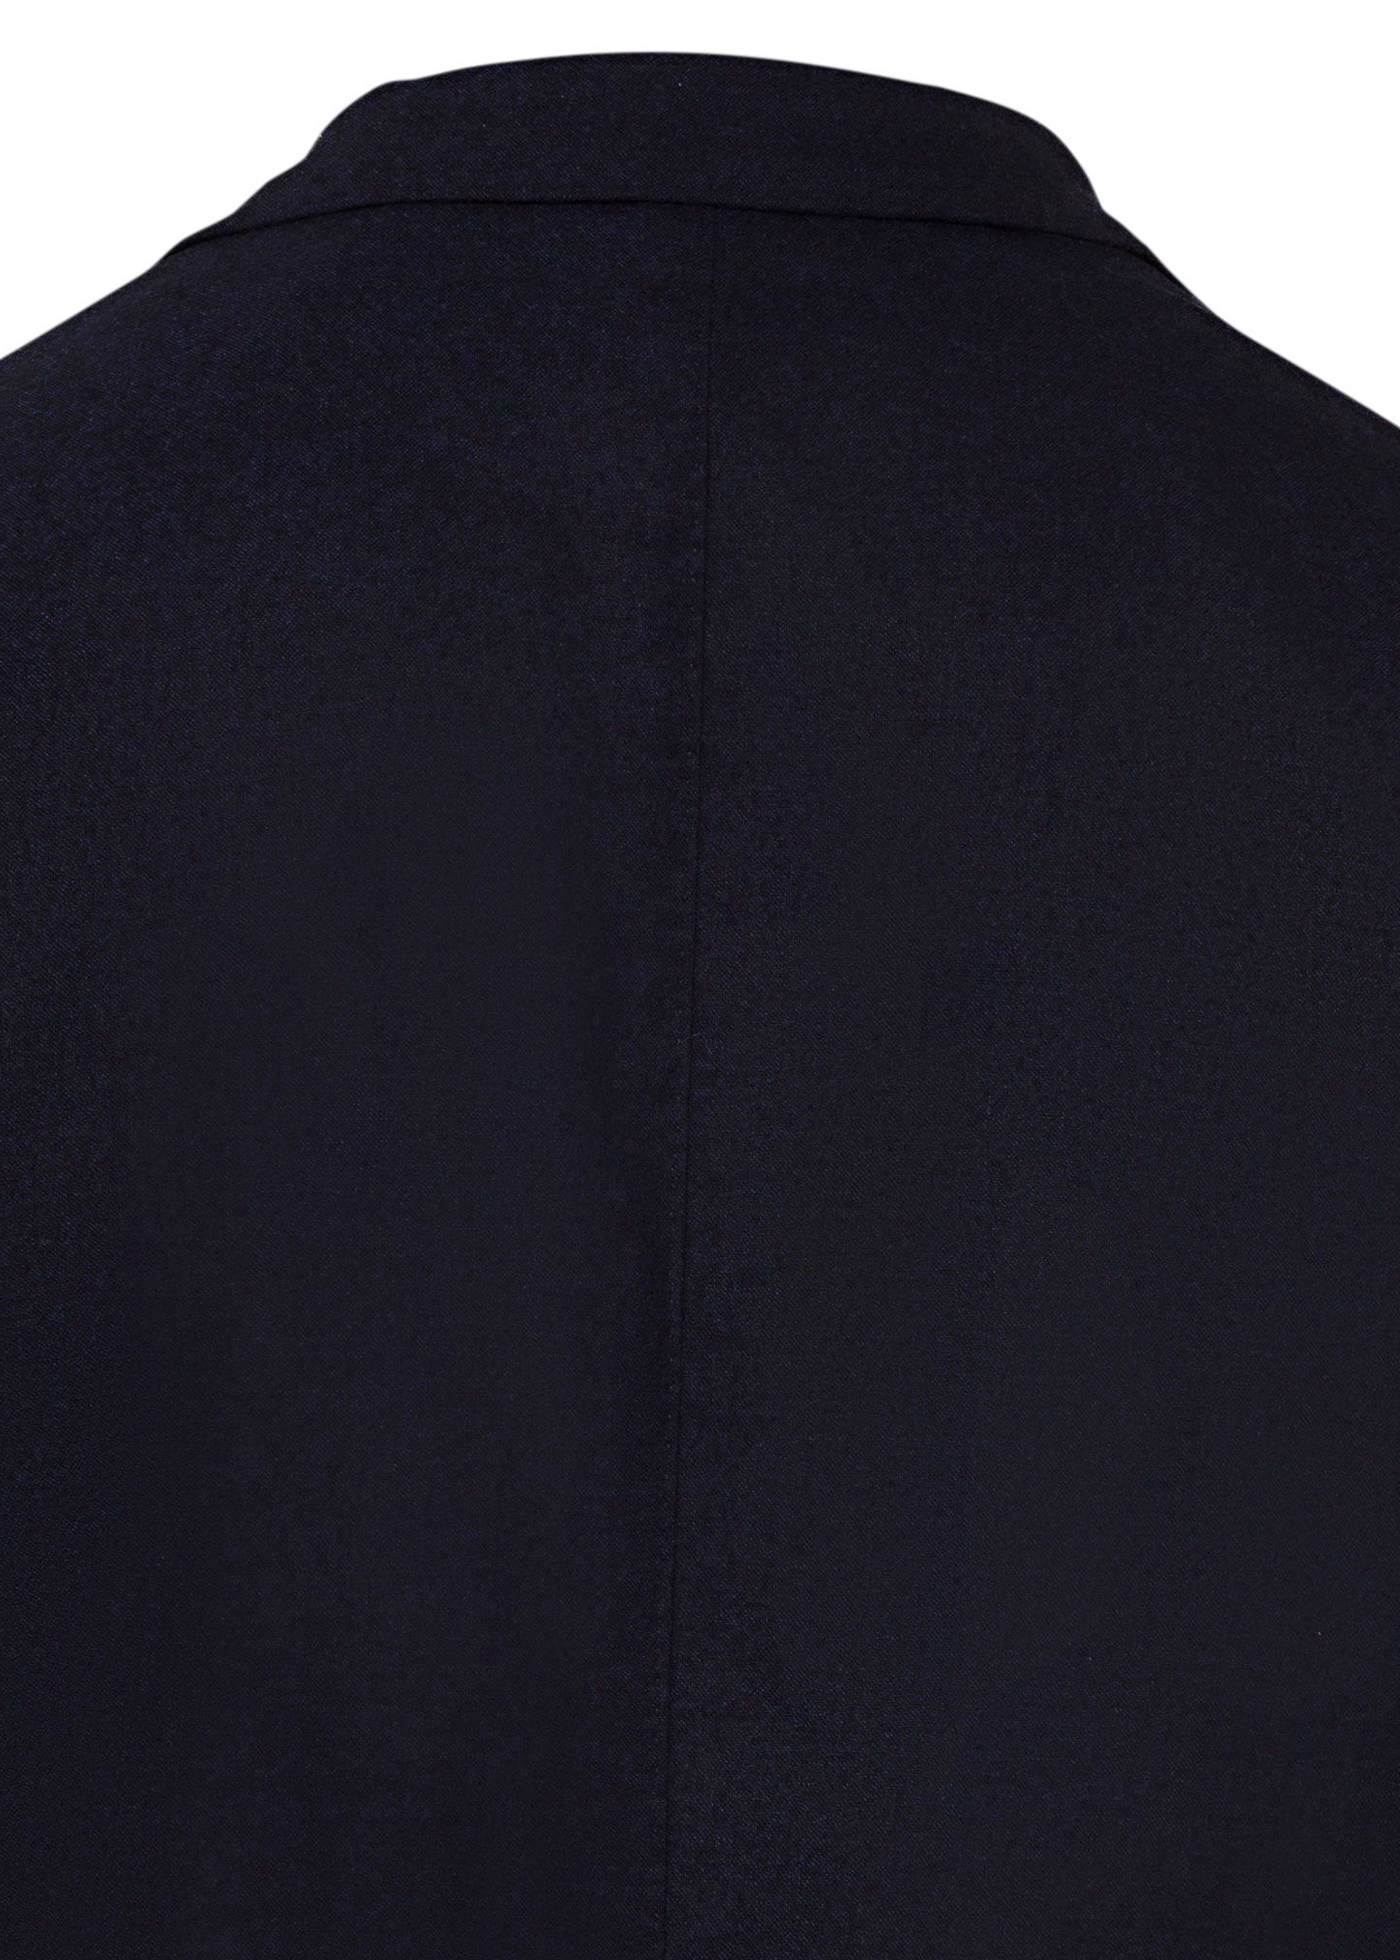 Fine Wool Blazer image number 3